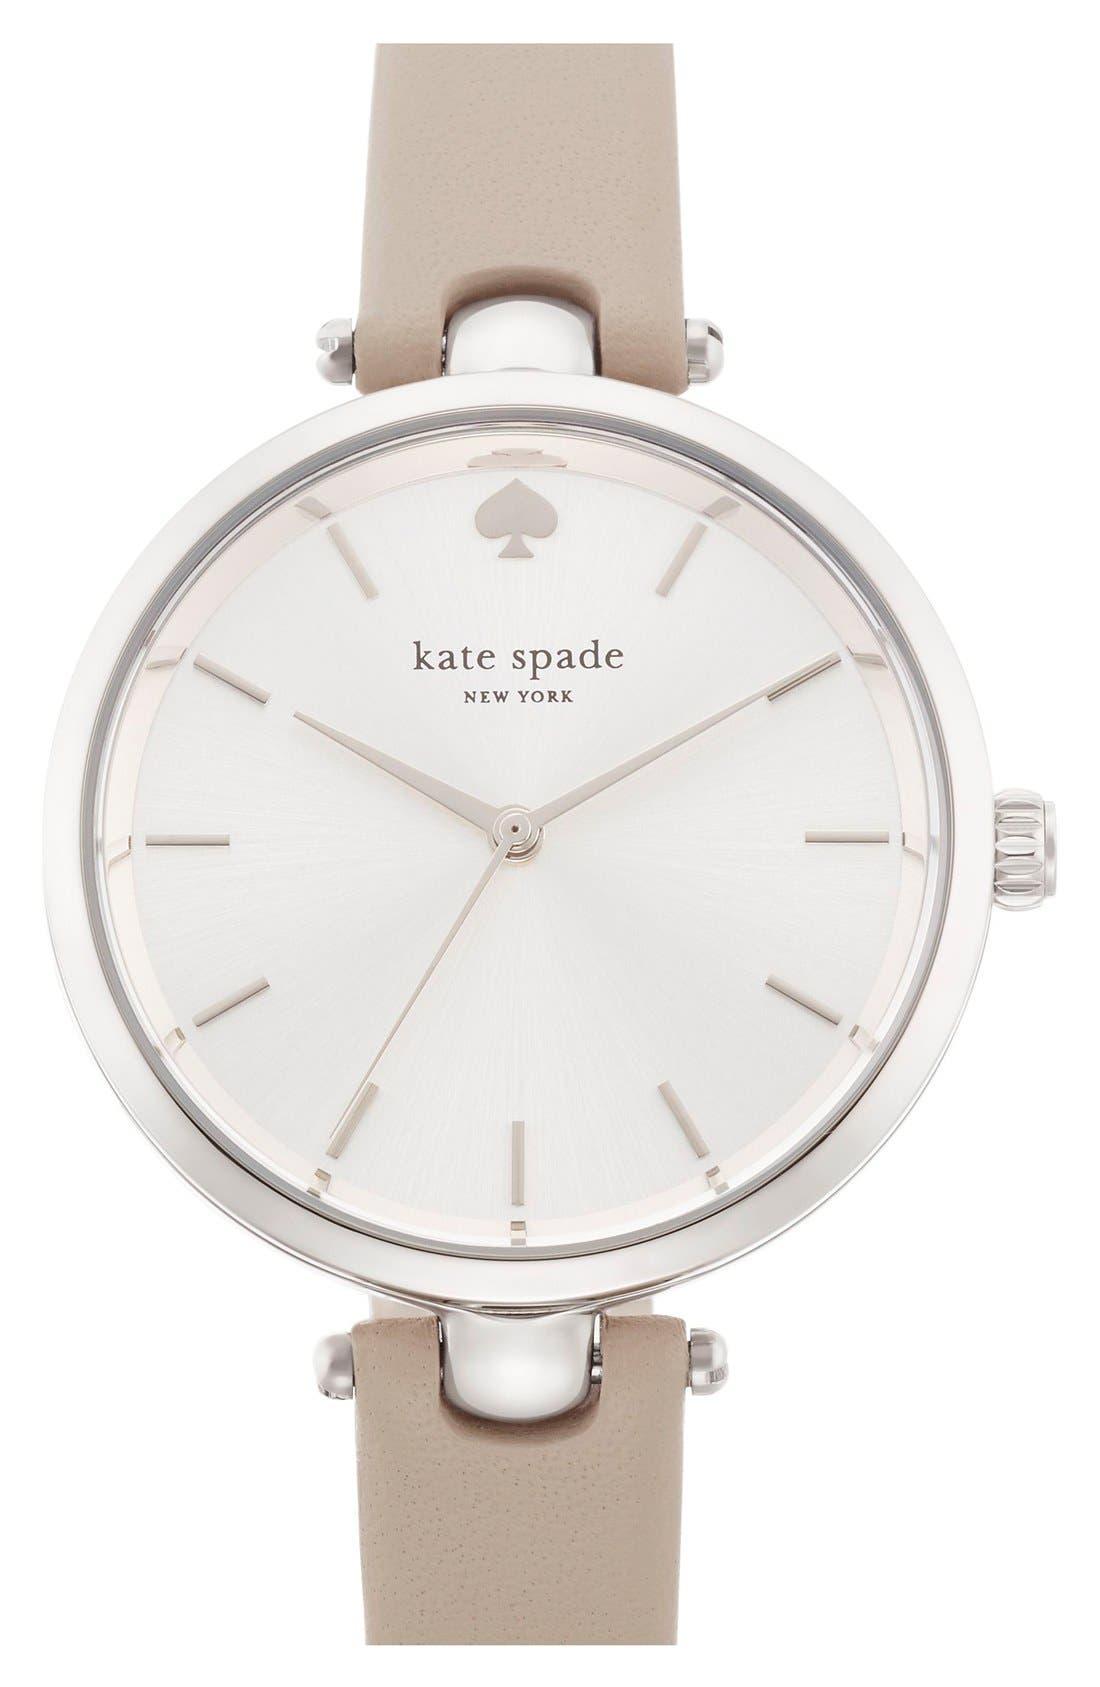 KATE SPADE NEW YORK, 'holland' round watch, 34mm, Main thumbnail 1, color, CLOCKTOWER GREY/ SILVER